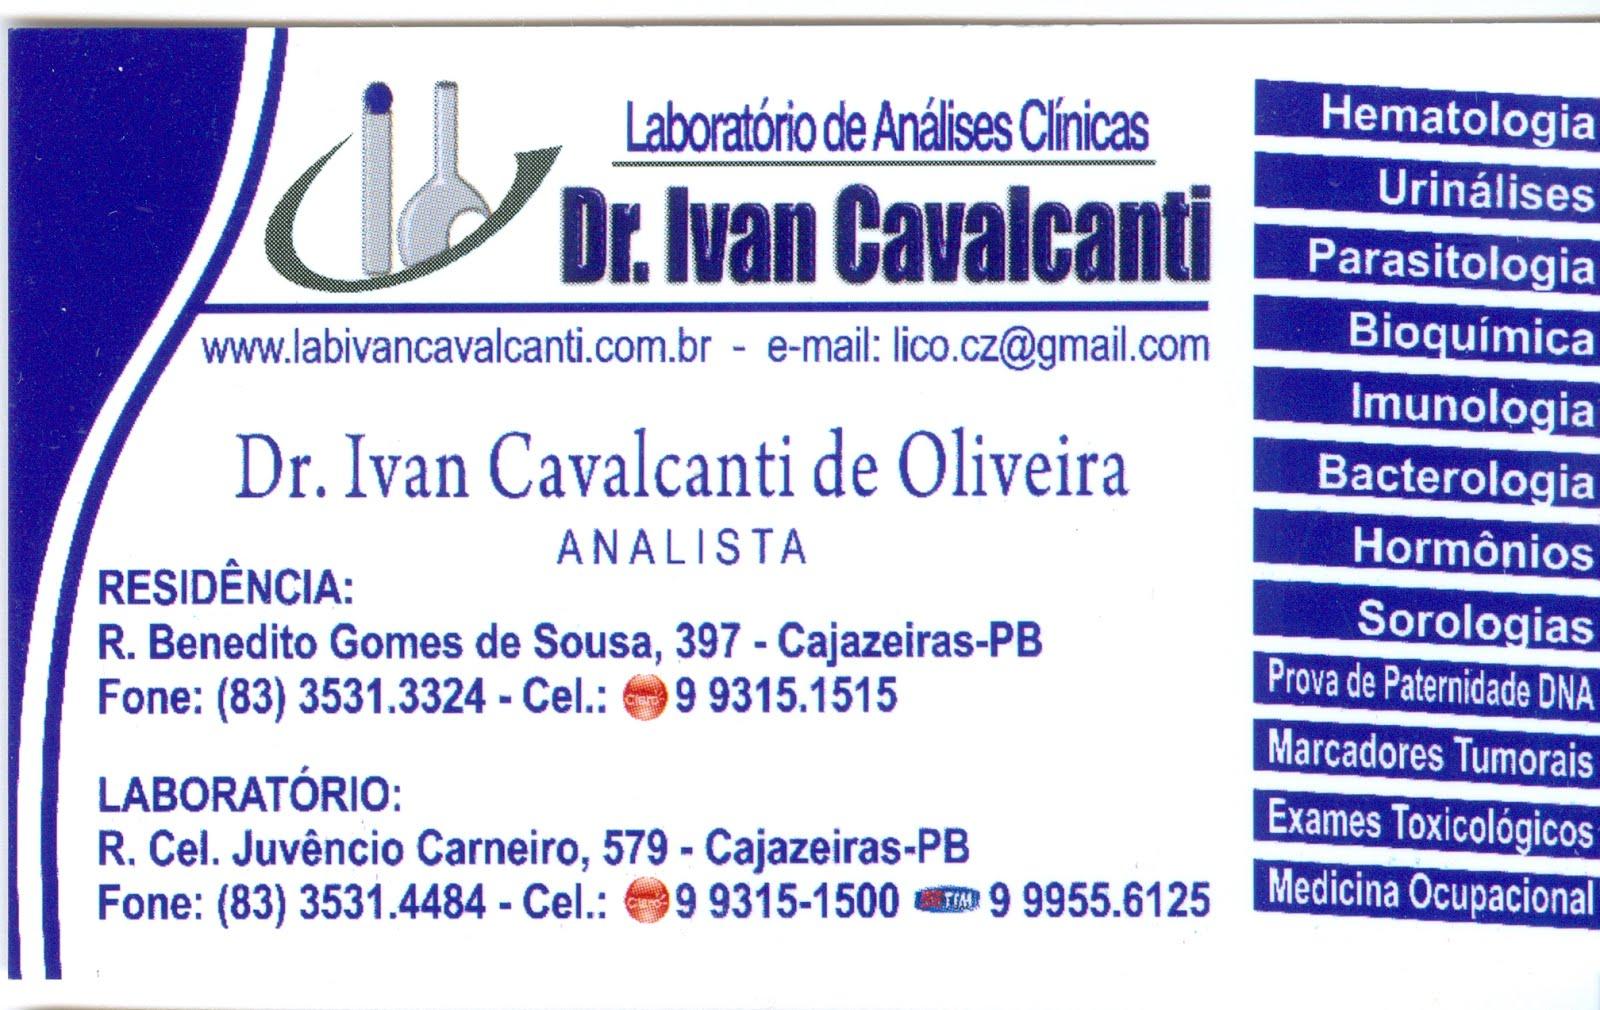 LABORATÓRIO  DE ANÁLISES CLÍNICAS  DR  IVAN  CAVALCANTI